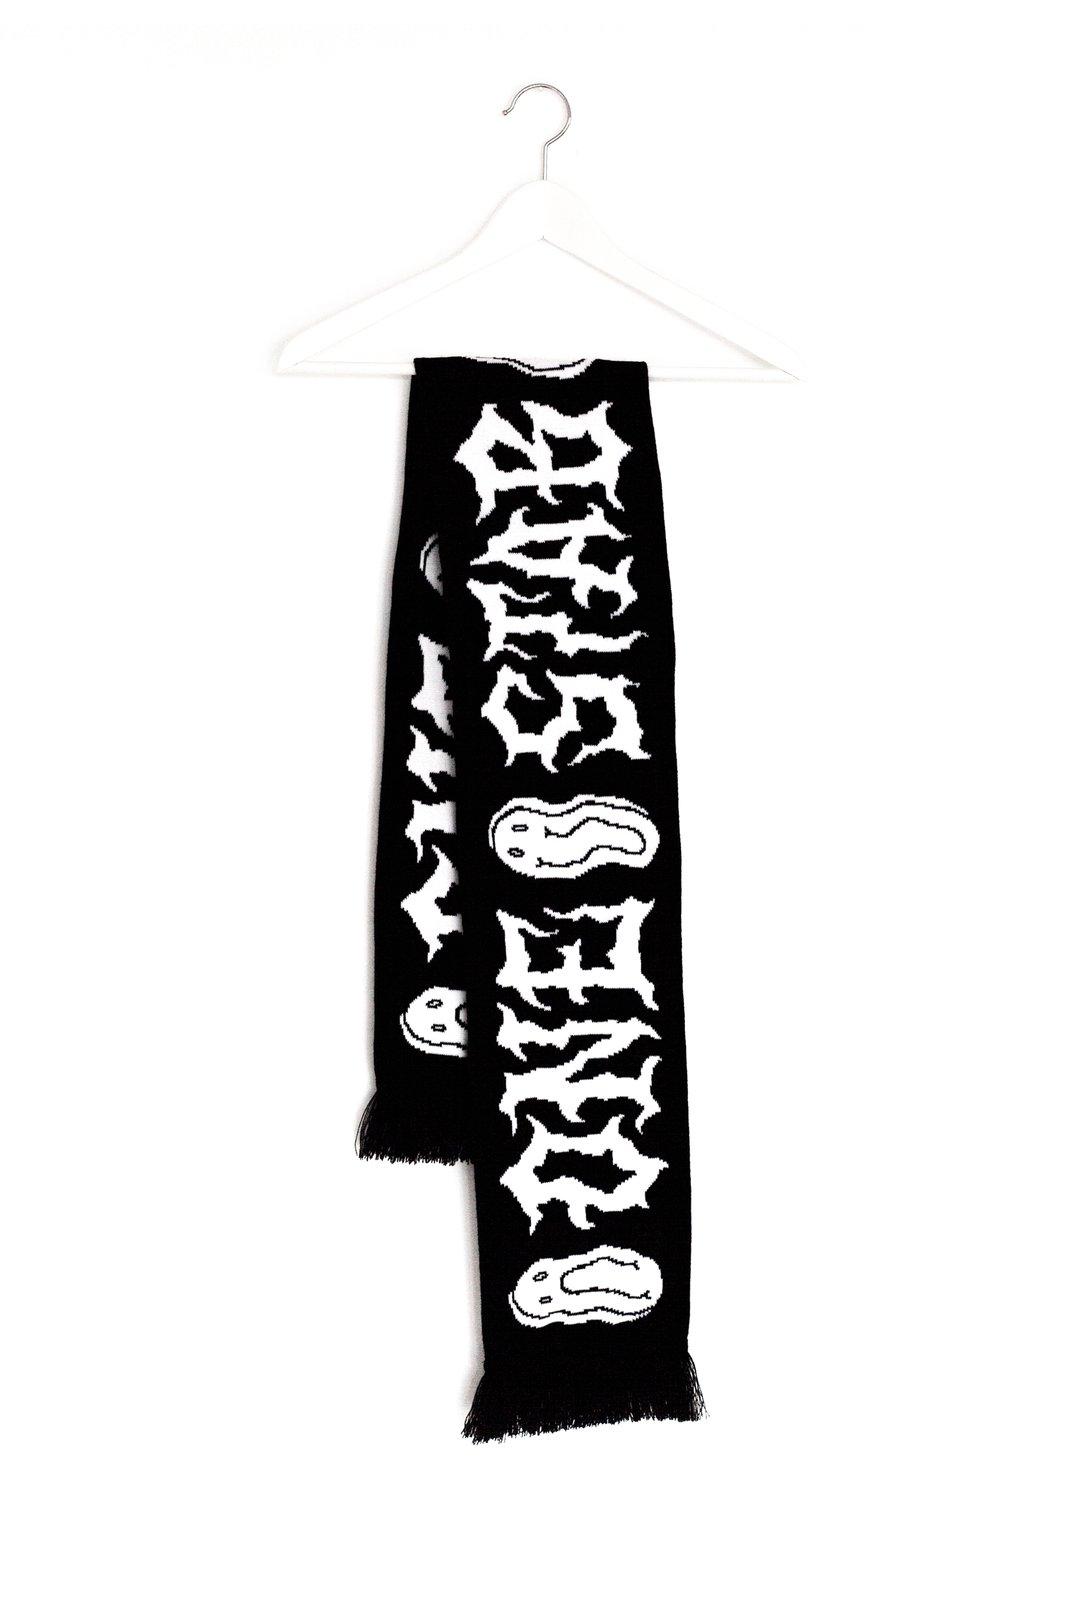 Image of Hooligan scarf